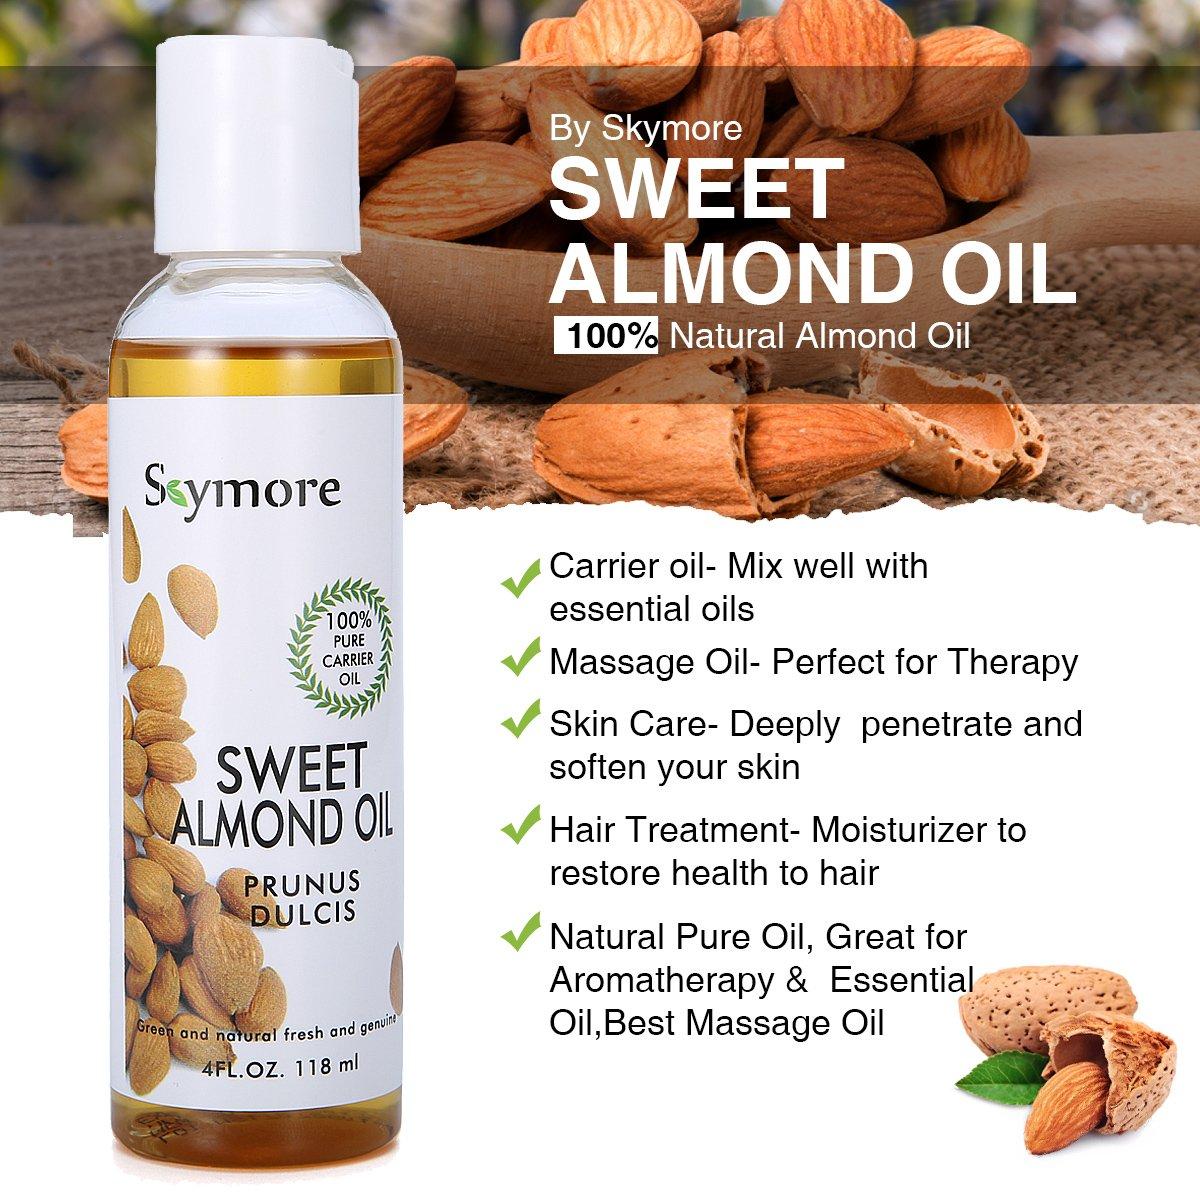 Skymore Top 4 100% Pure Carrier Oil Set (aceite de almendras, aceite de coco, aceite de aguacate, aceite de ricino), Aceite Carrier puro para cabello y uñas ...